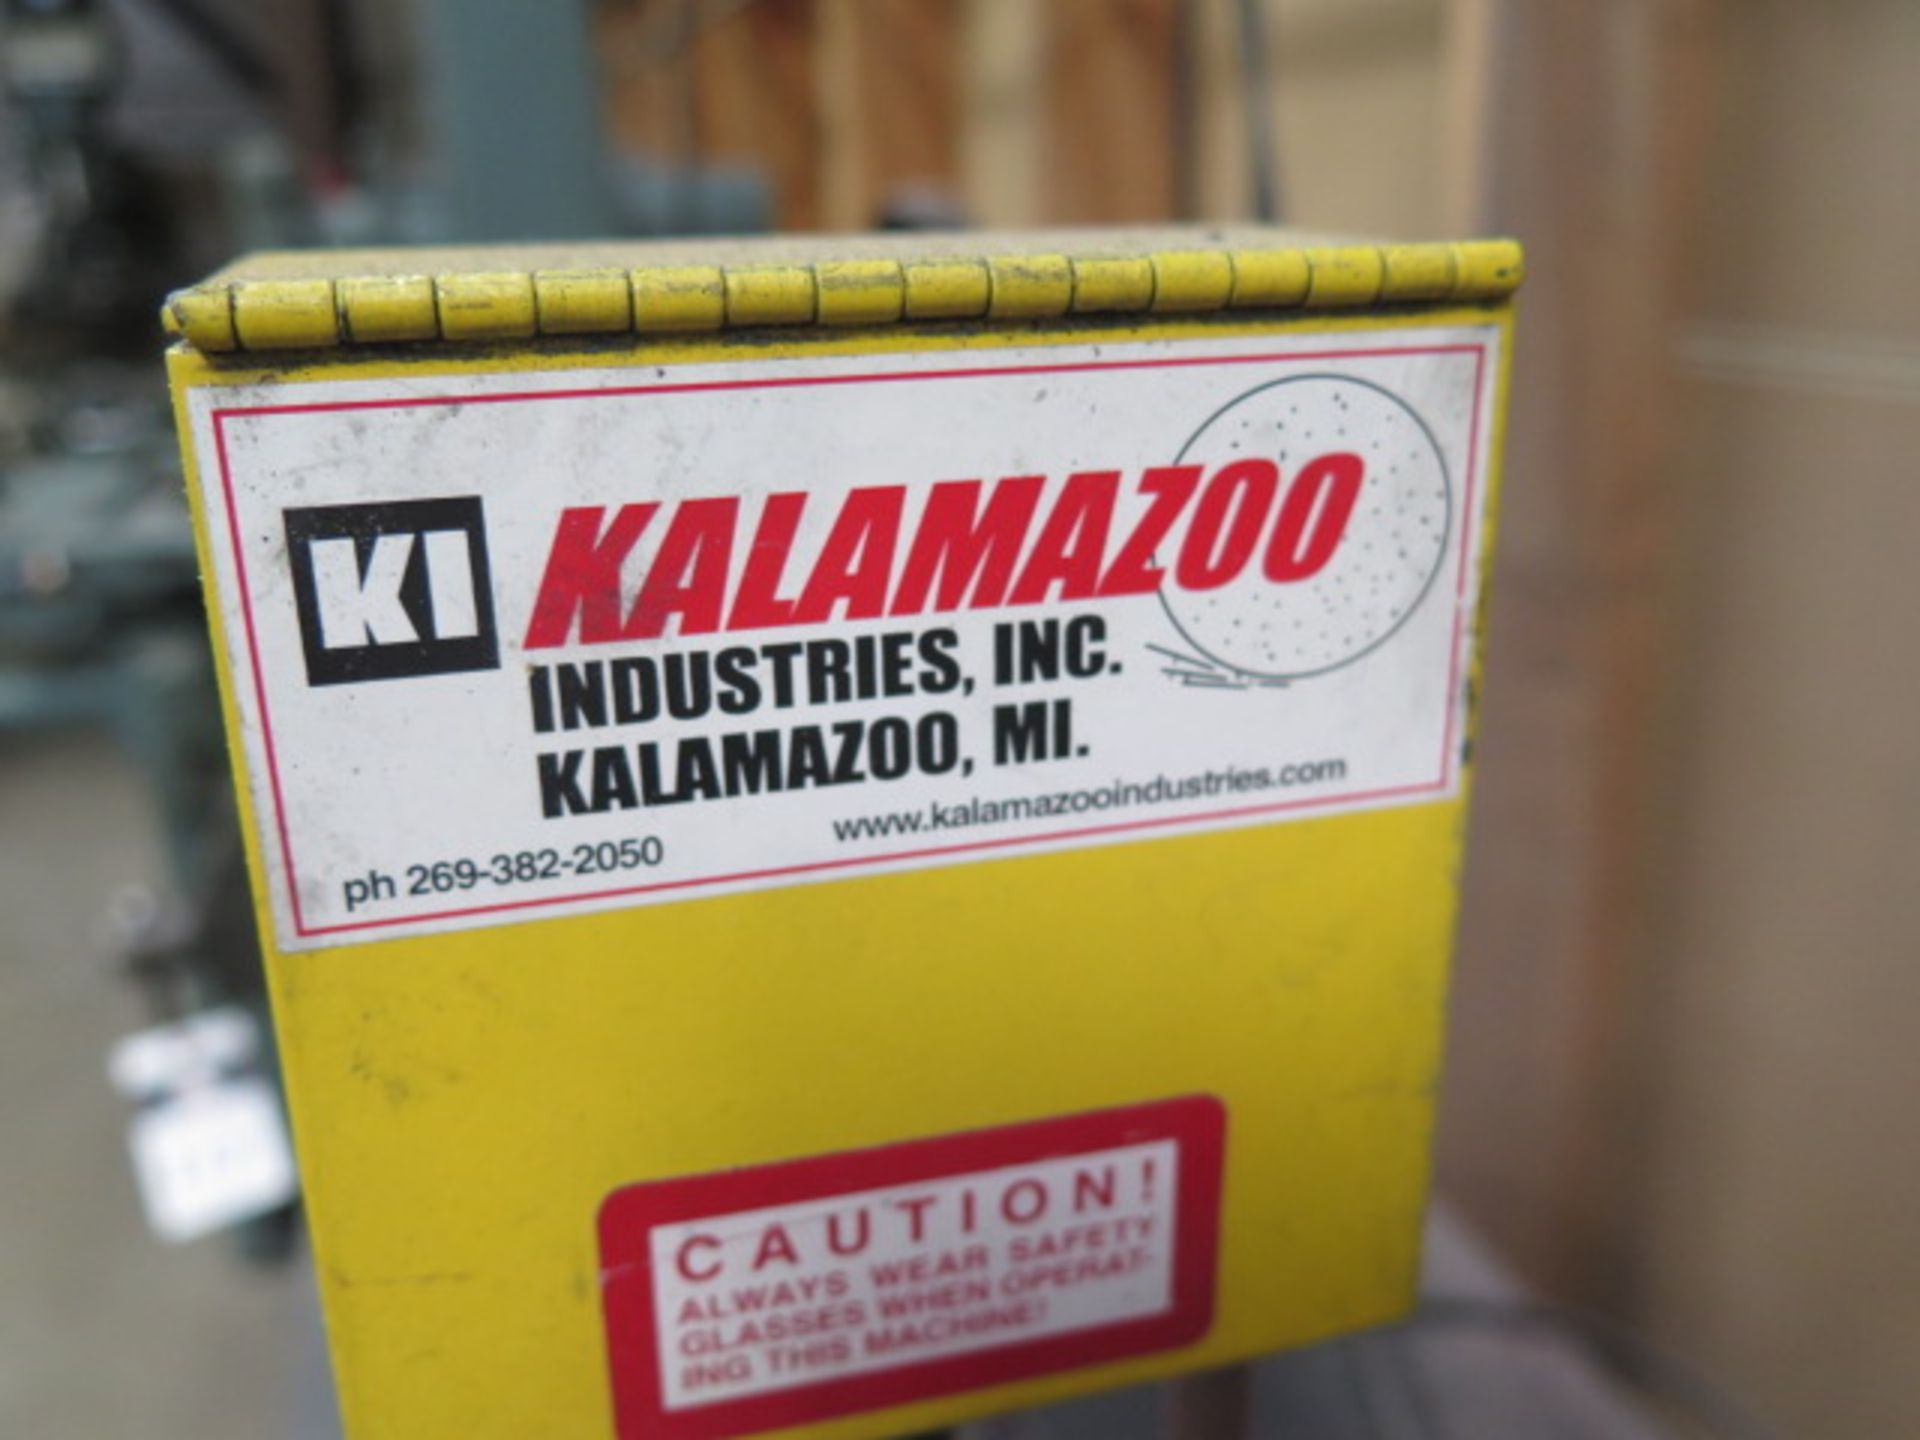 "Kalamazoo 1"" Belt Sander (SOLD AS-IS - NO WARRANTY) - Image 3 of 5"